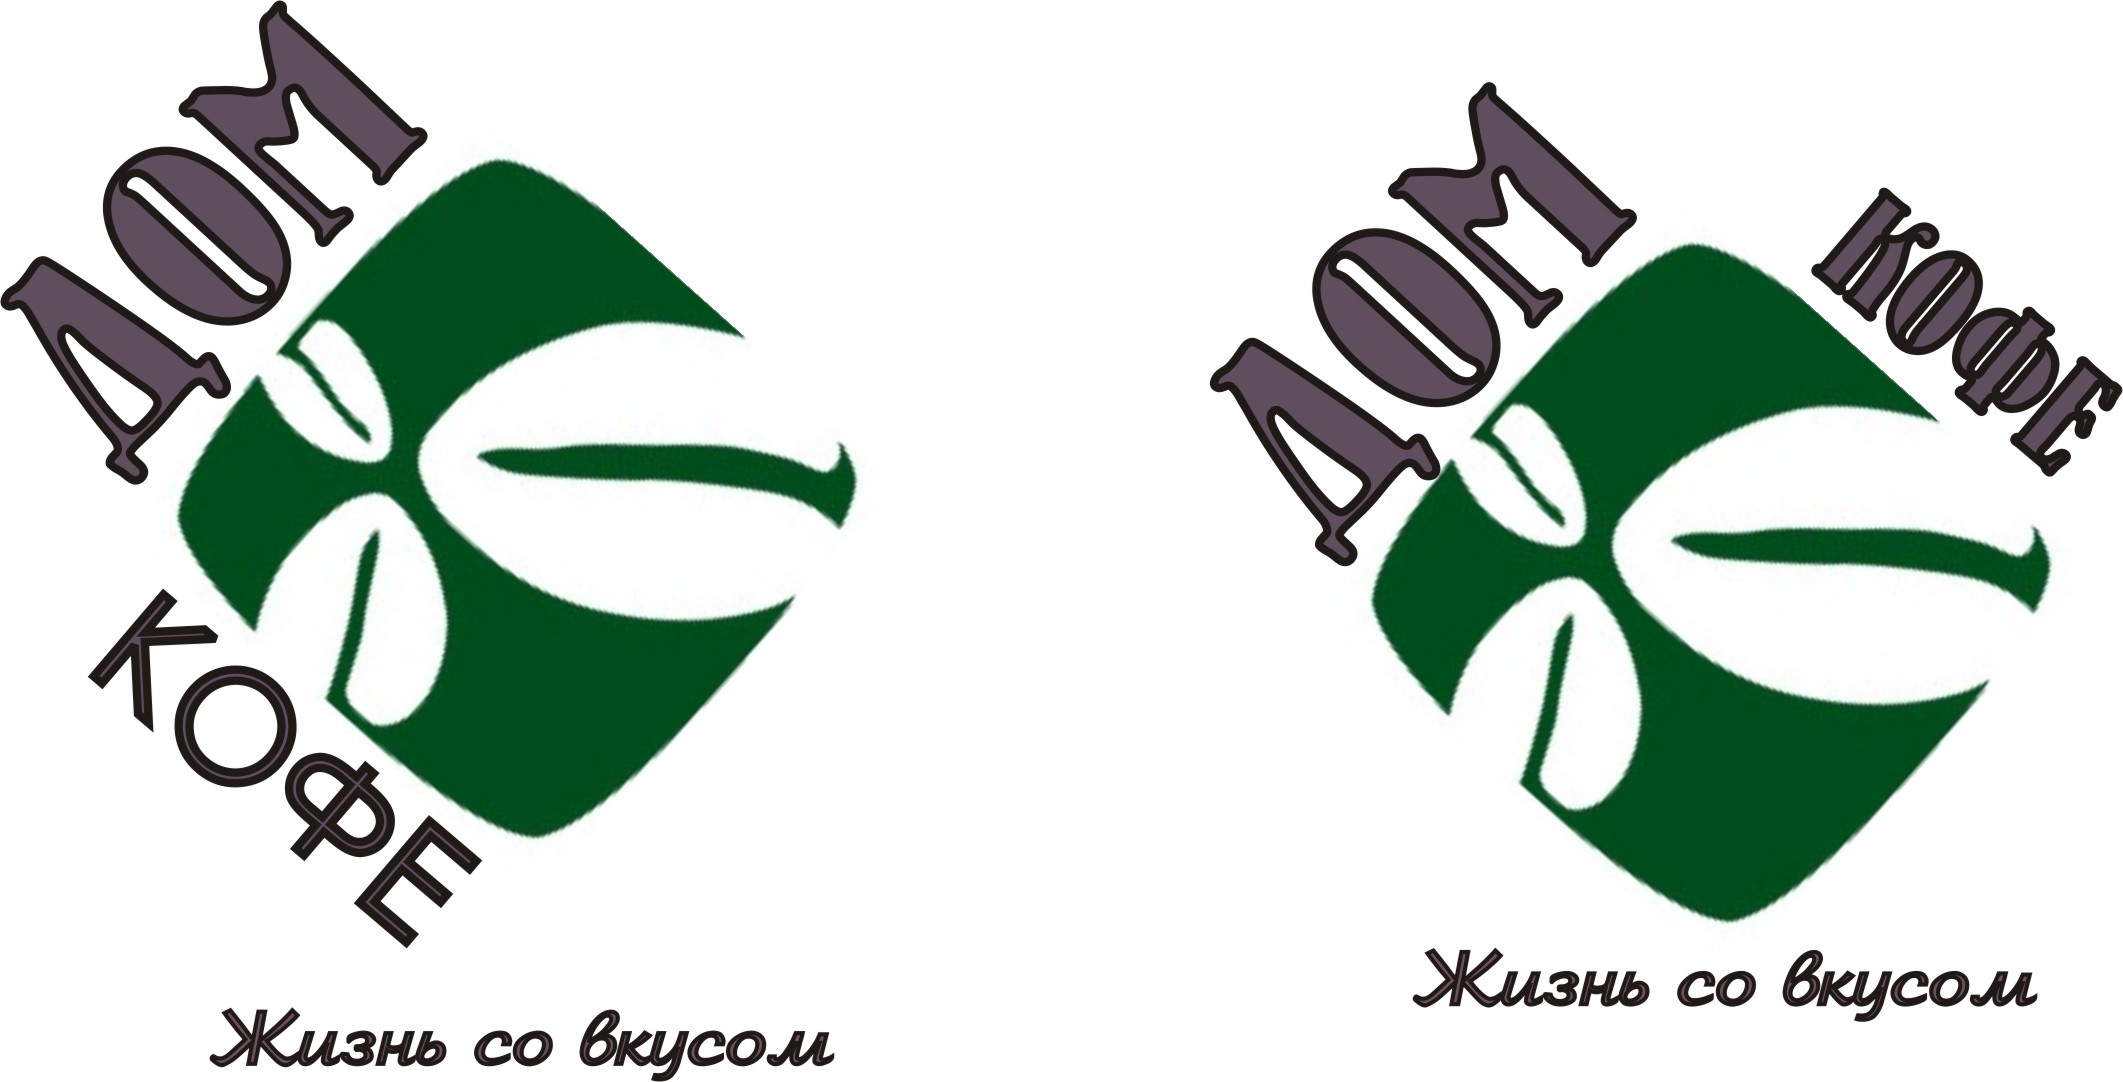 Редизайн логотипа фото f_0425333fe780aadb.jpg